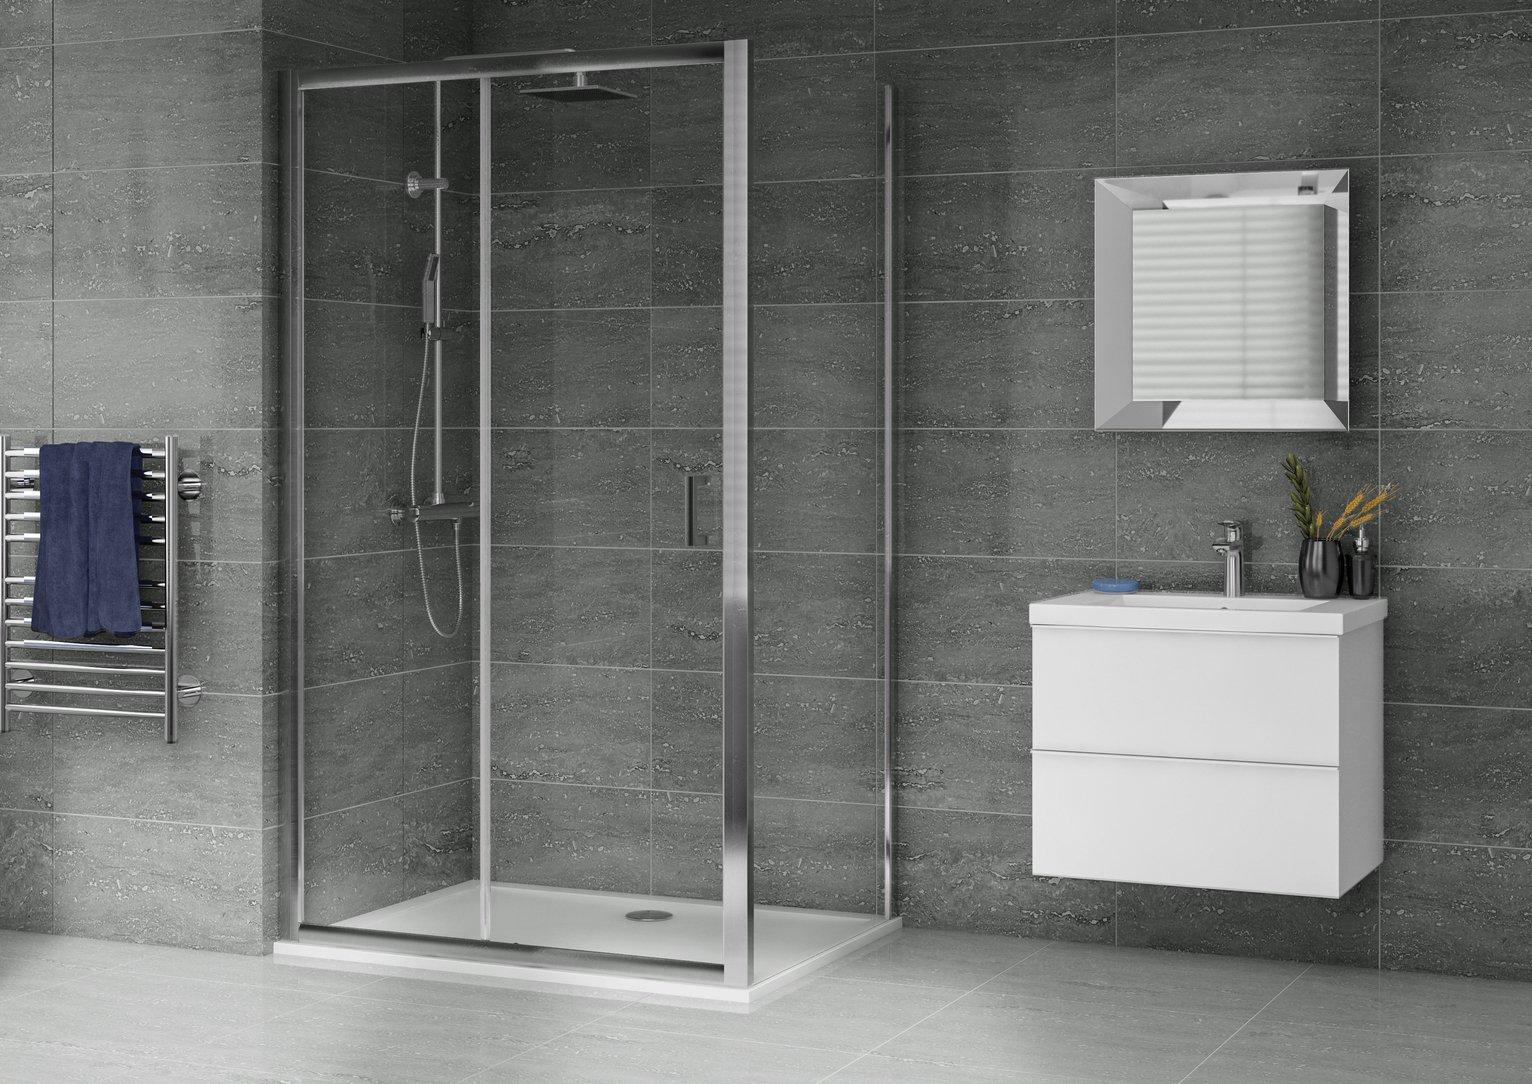 Aqualux 1200mm x 900mm Sliding Door Shower Enclosure & Tray